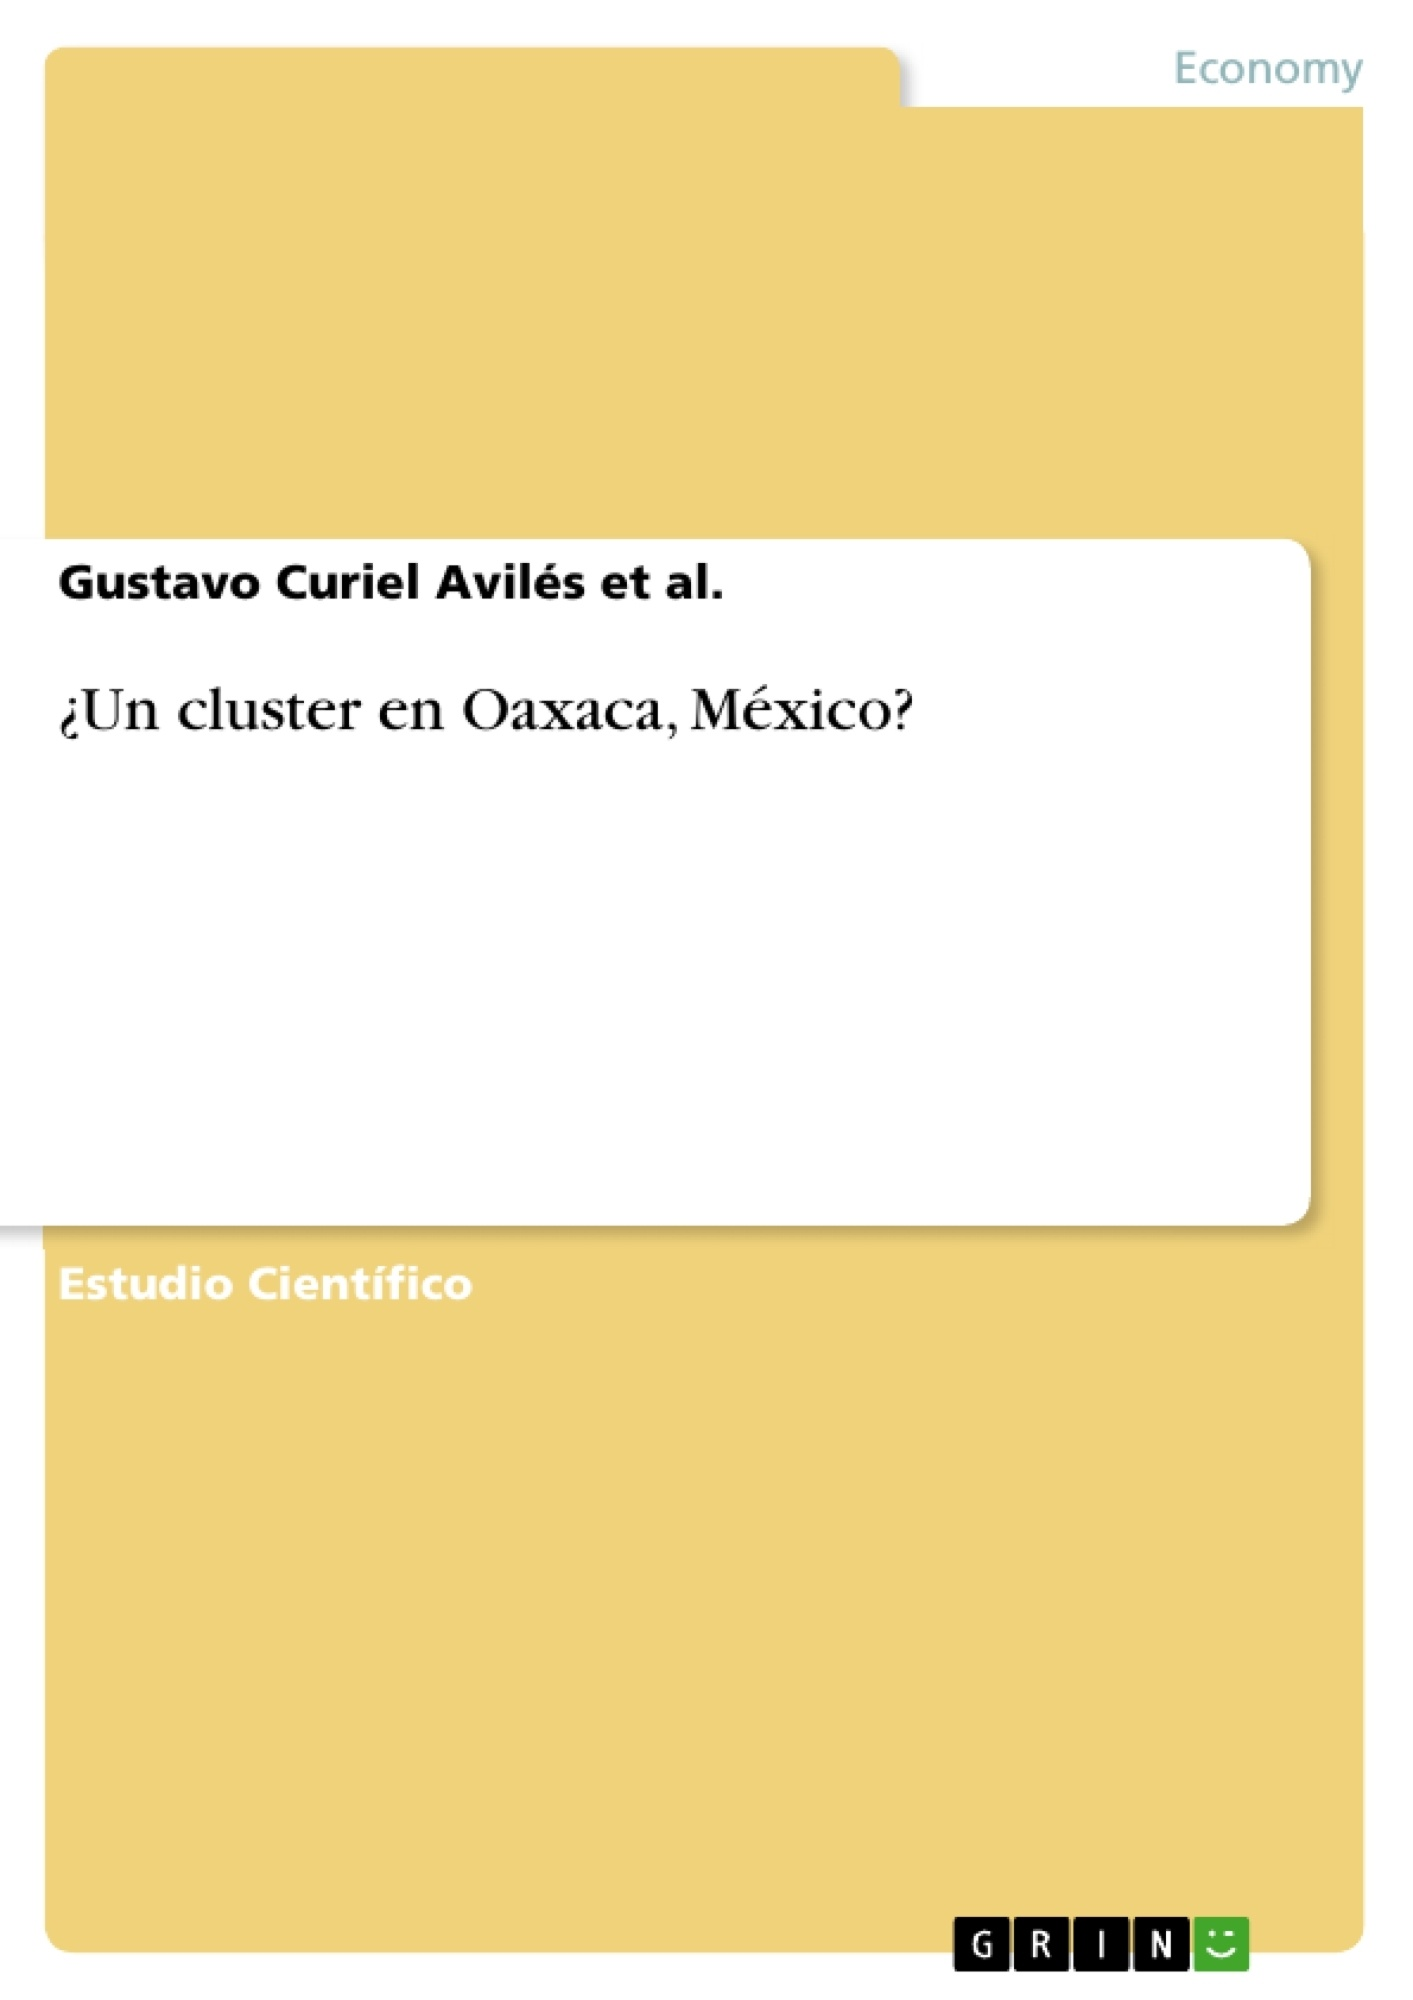 Título: ¿Un cluster en Oaxaca, México?